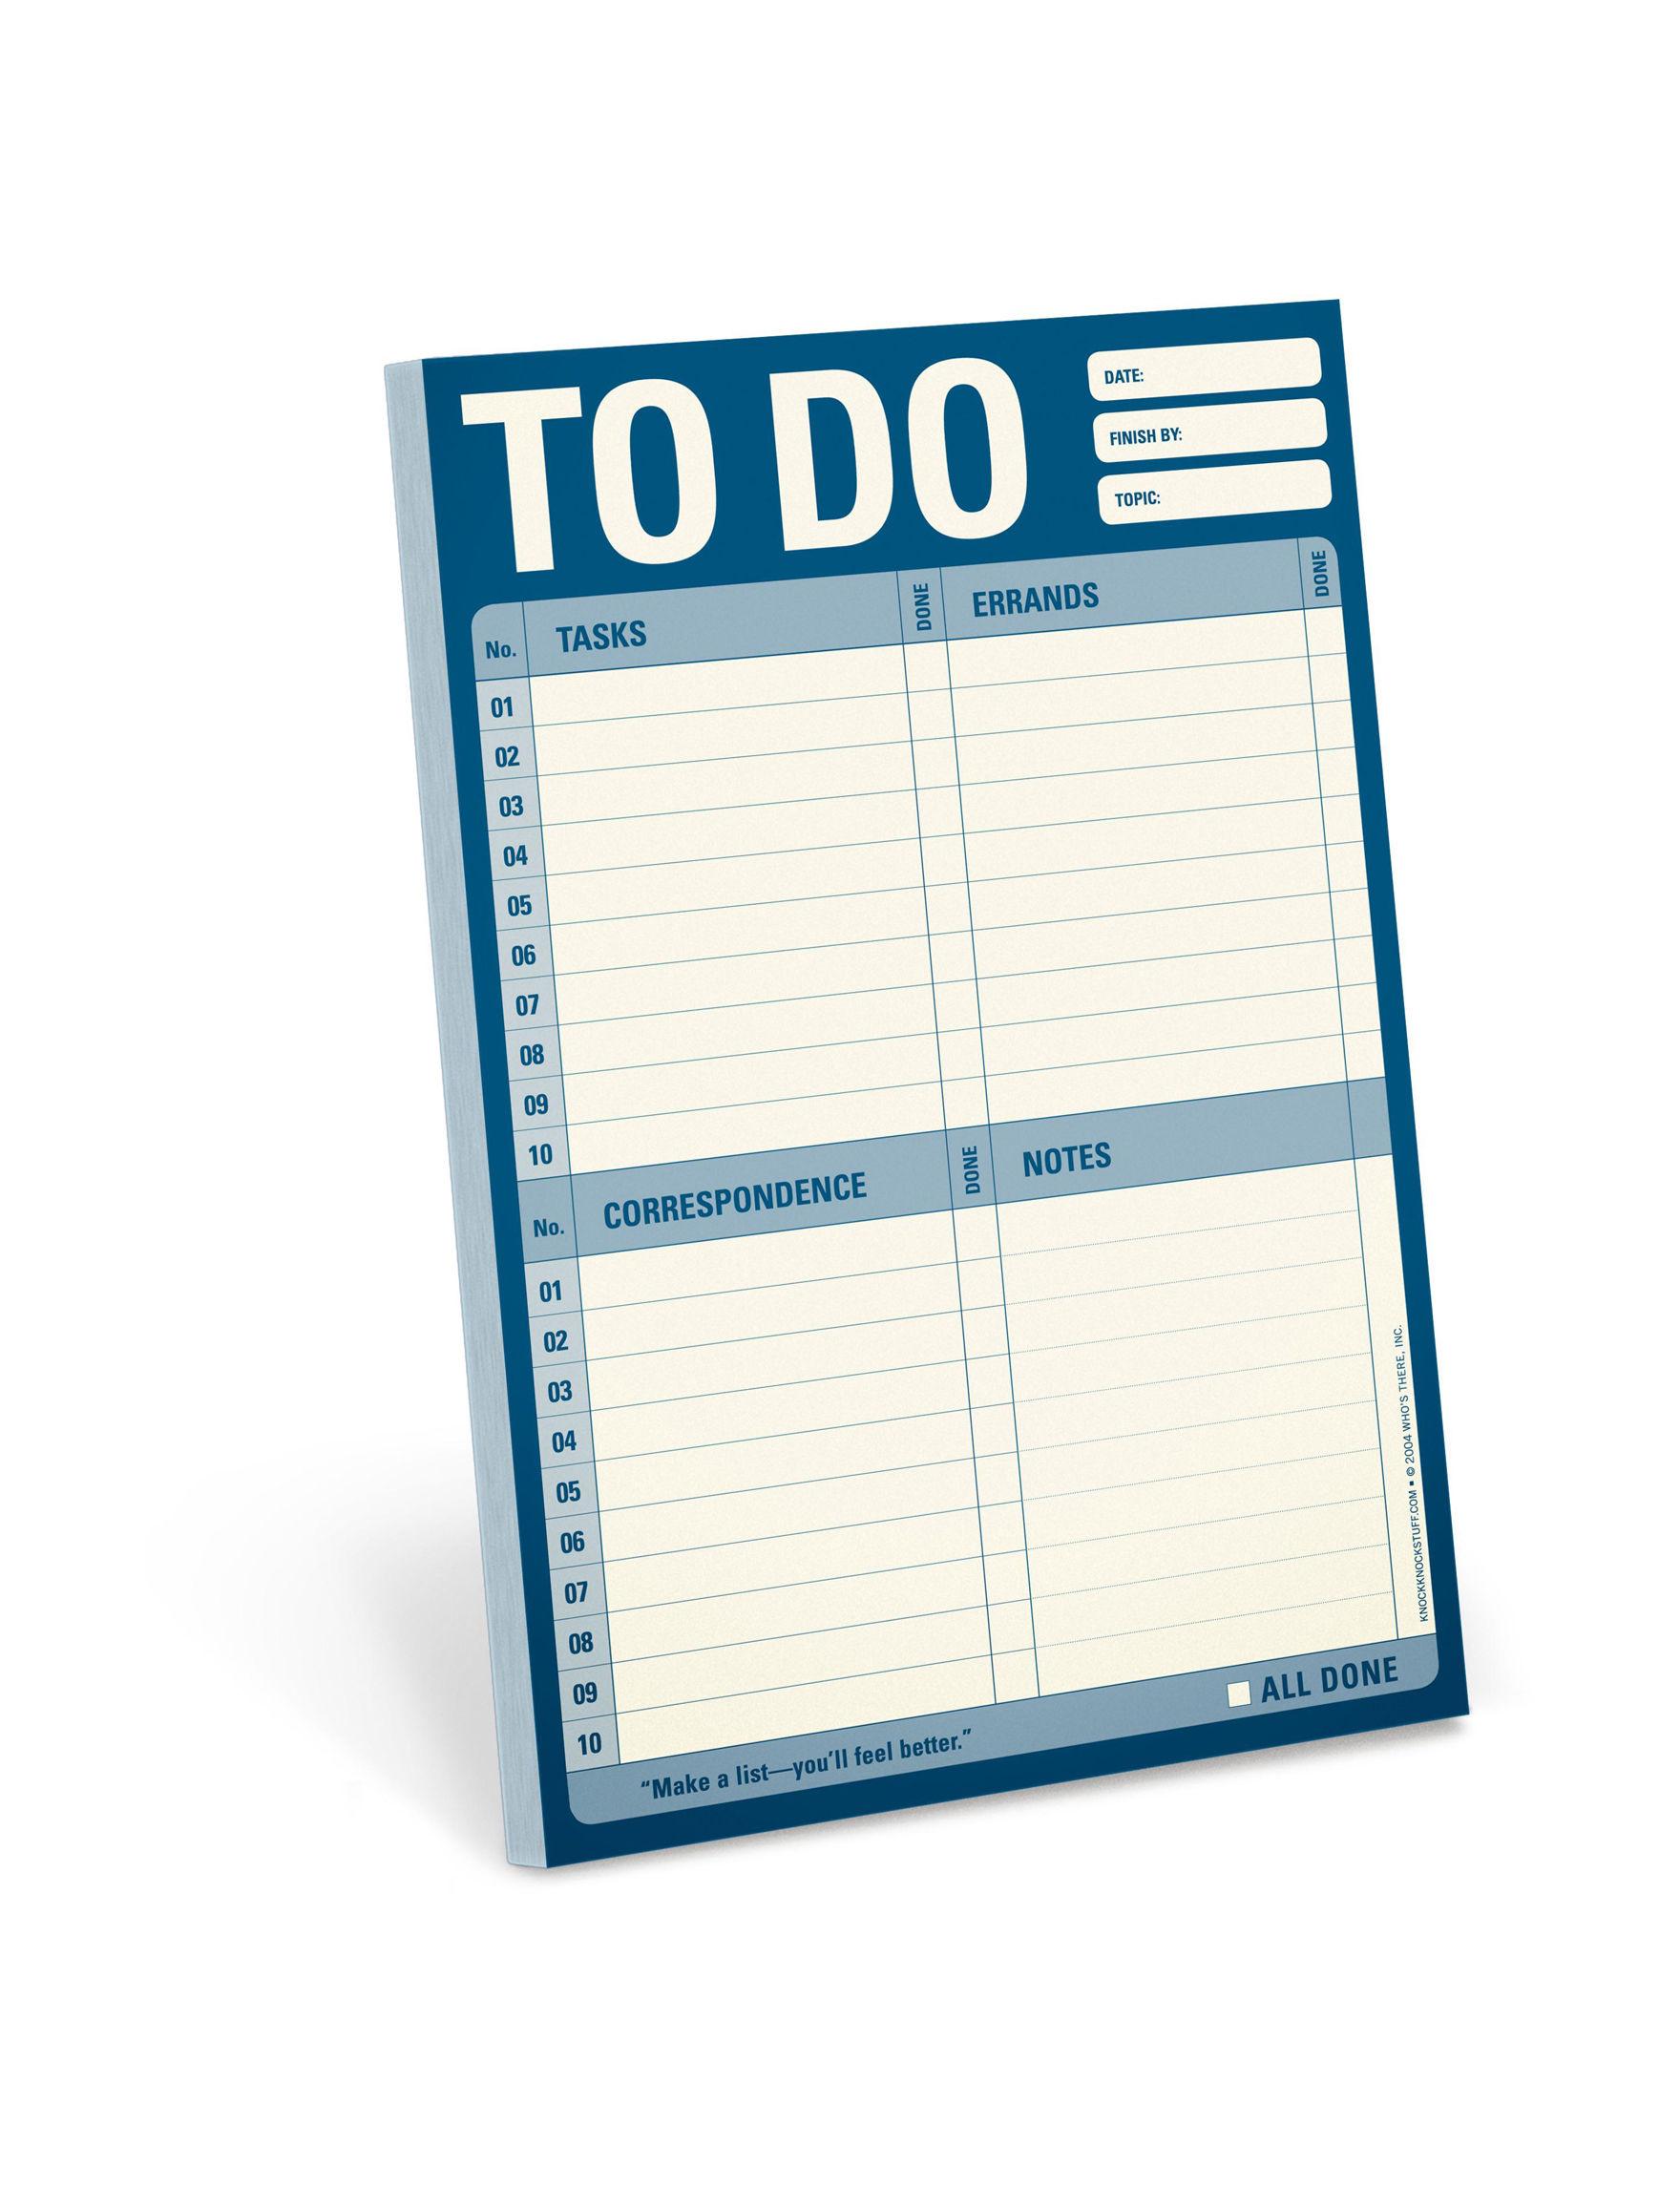 Knock Knock  Calendars & Planners Journals & Notepads School & Office Supplies